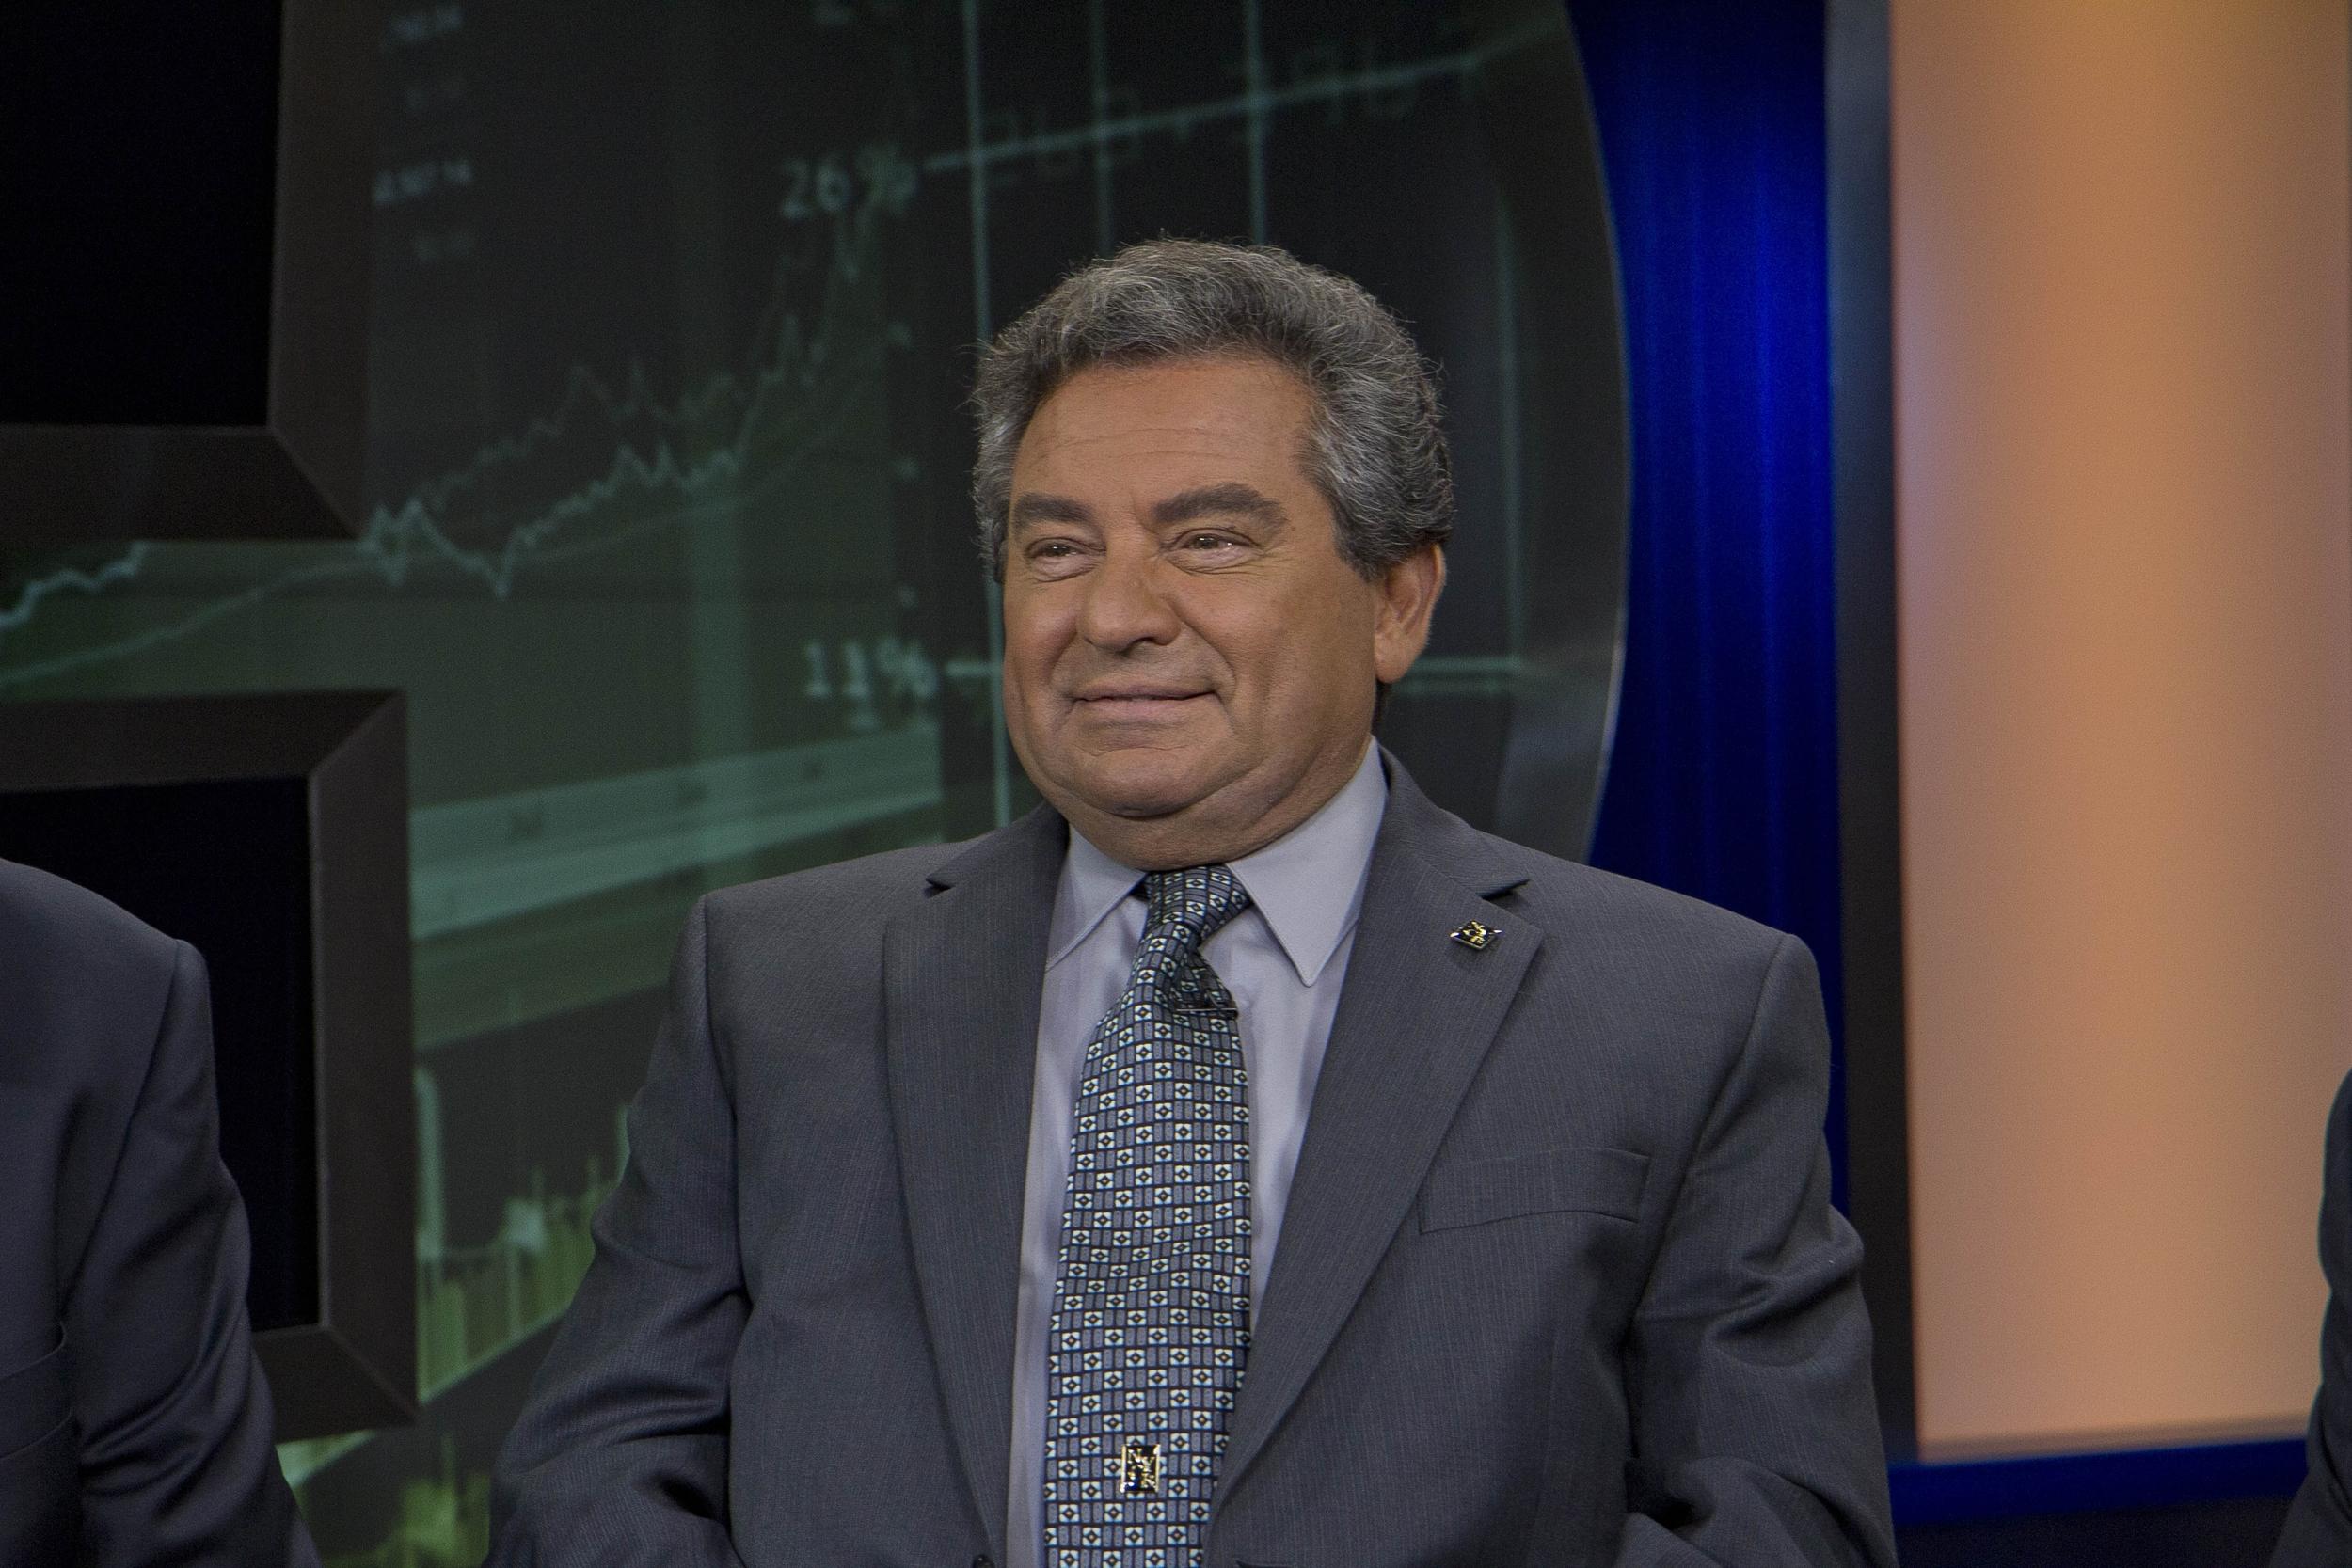 Joseph Ficalora